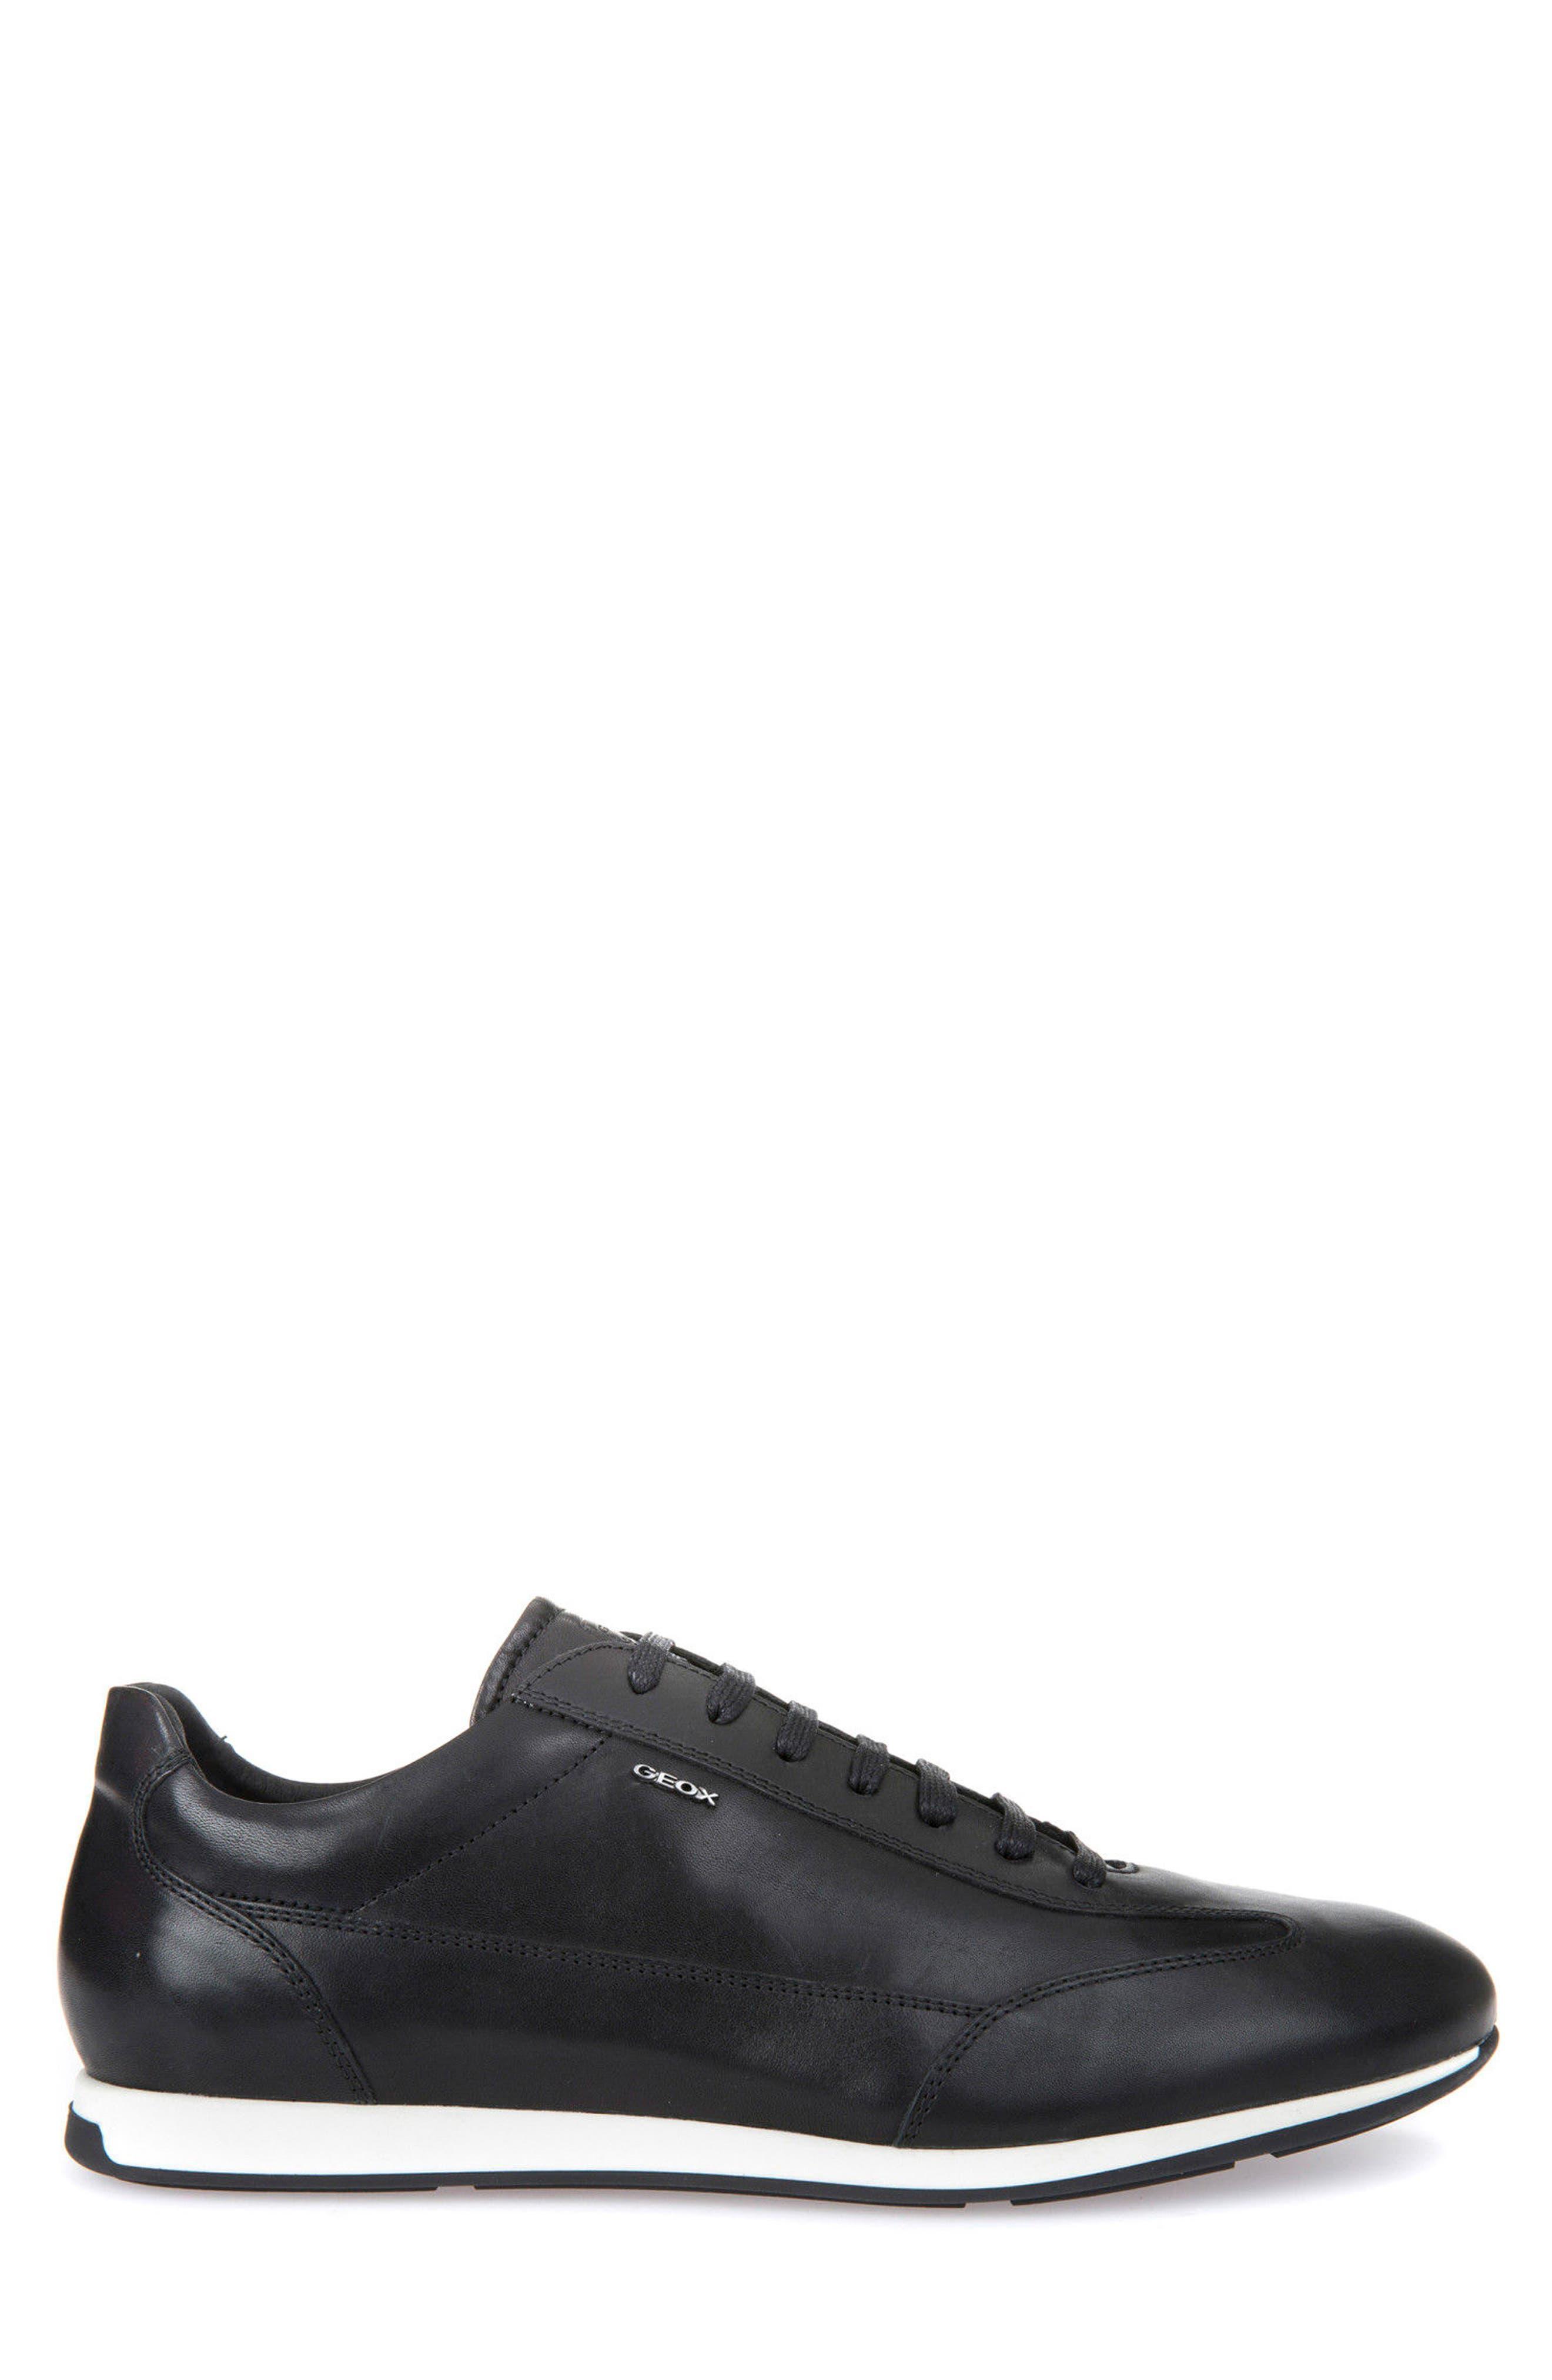 Alternate Image 3  - Geox Clemet 1 Sneaker (Men)